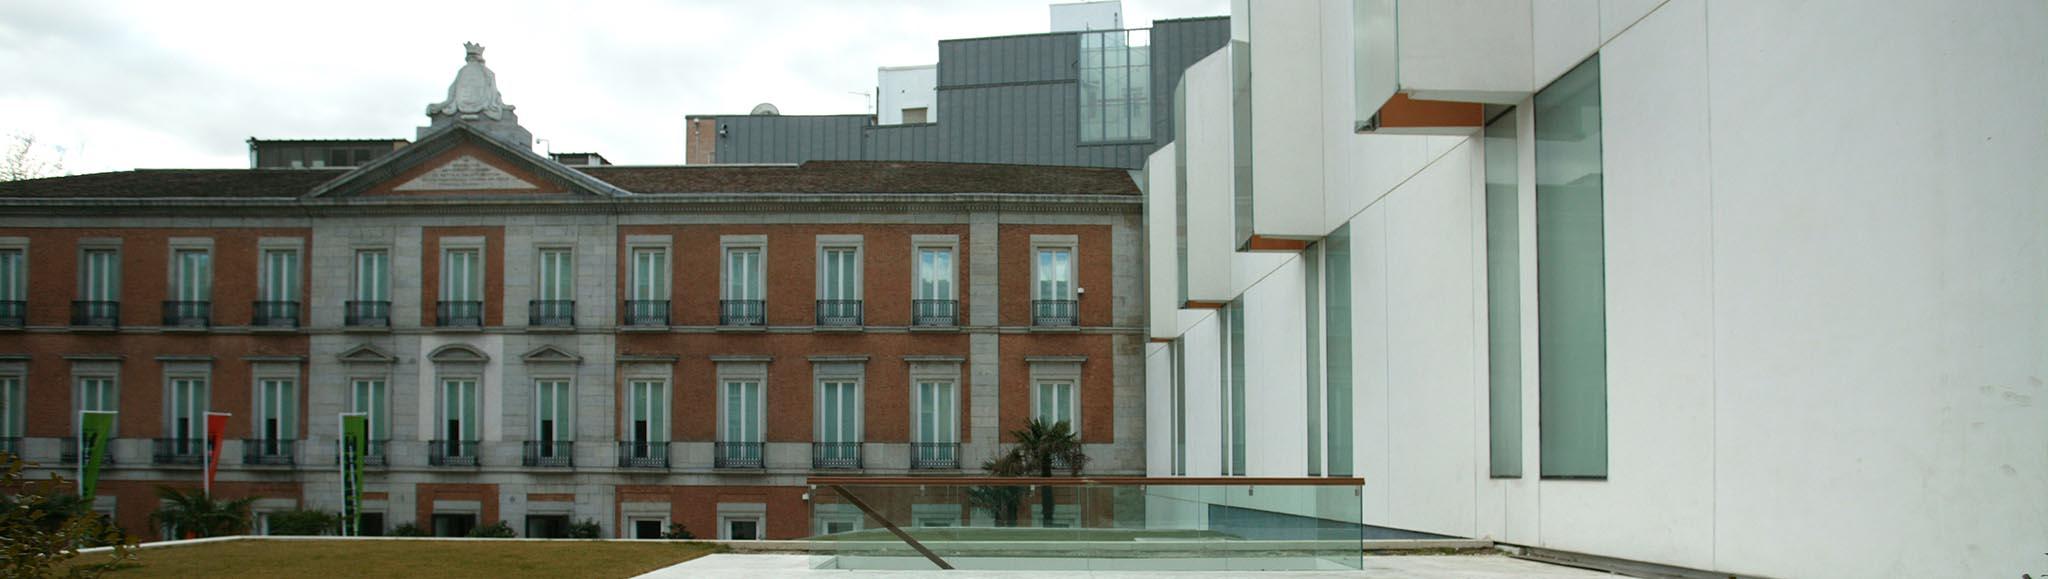 Музей Тиссена-Борнемисы в Мадриде, Испания